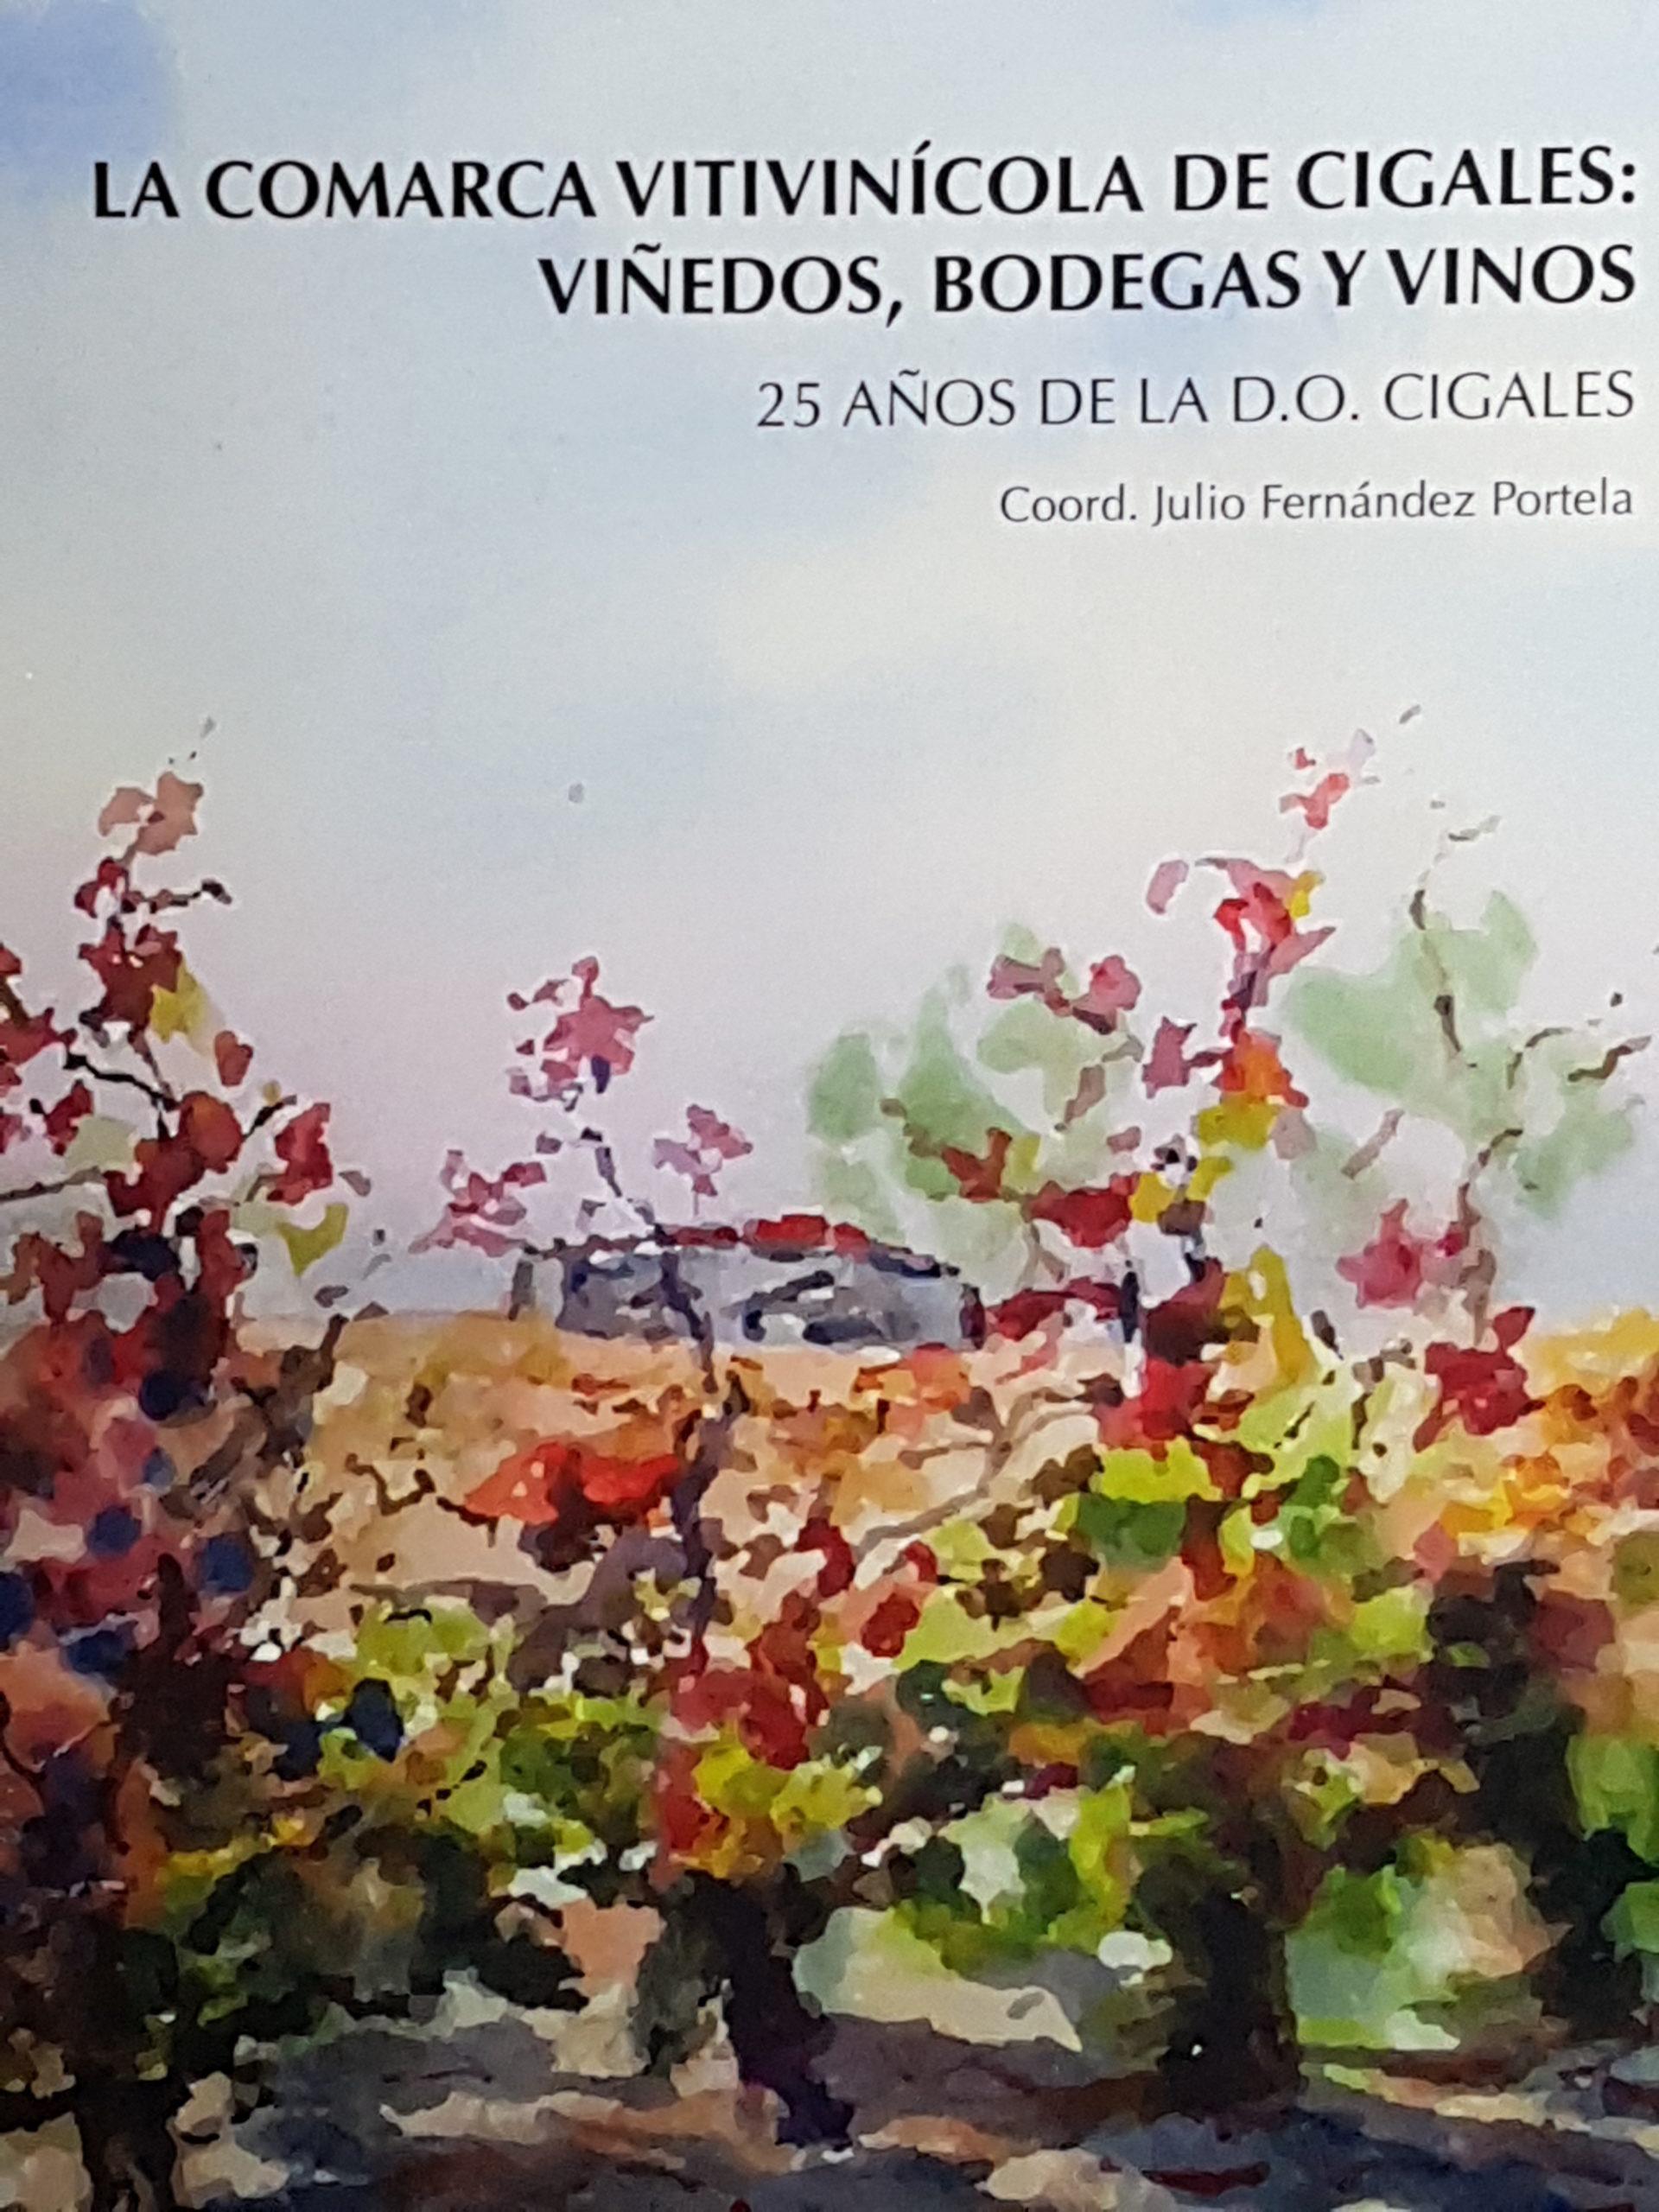 La comarca vitivinícola de Cigales